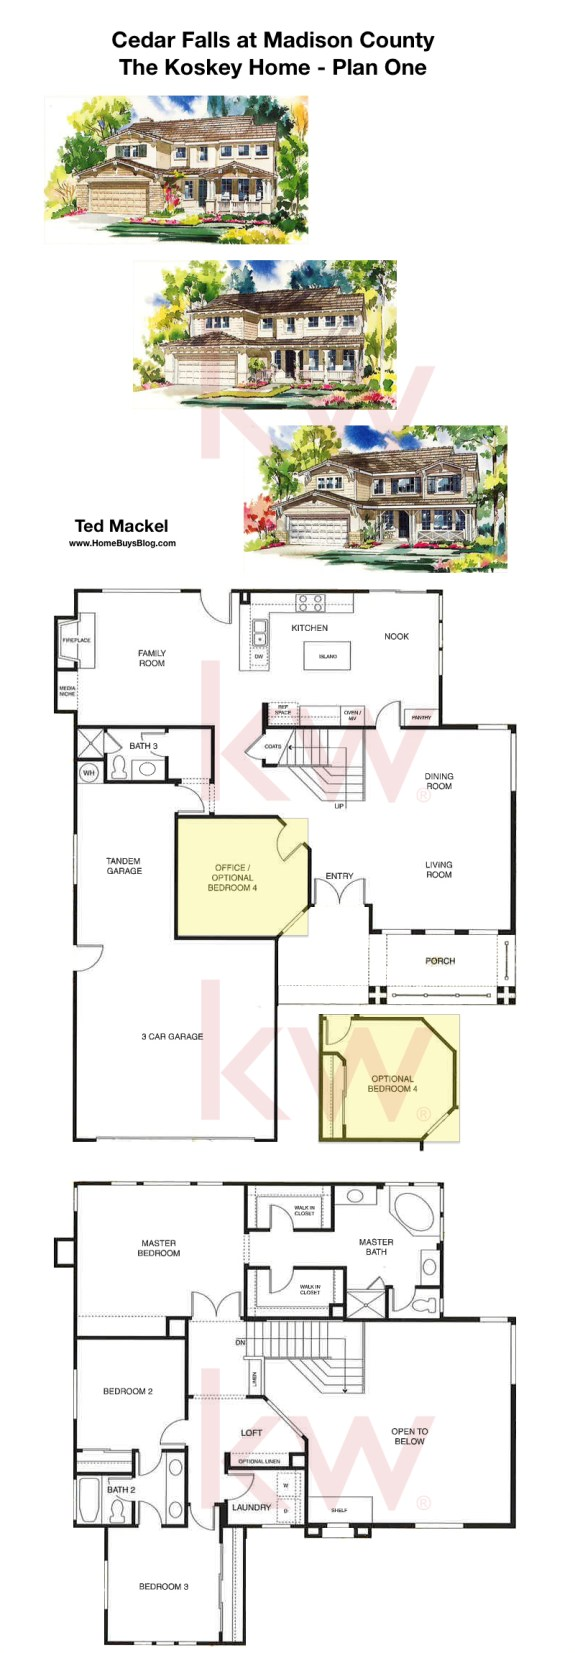 Cedar Falls Madison County Simi Valley Koskey Home Plan 1 Floor Plans Simi Valley